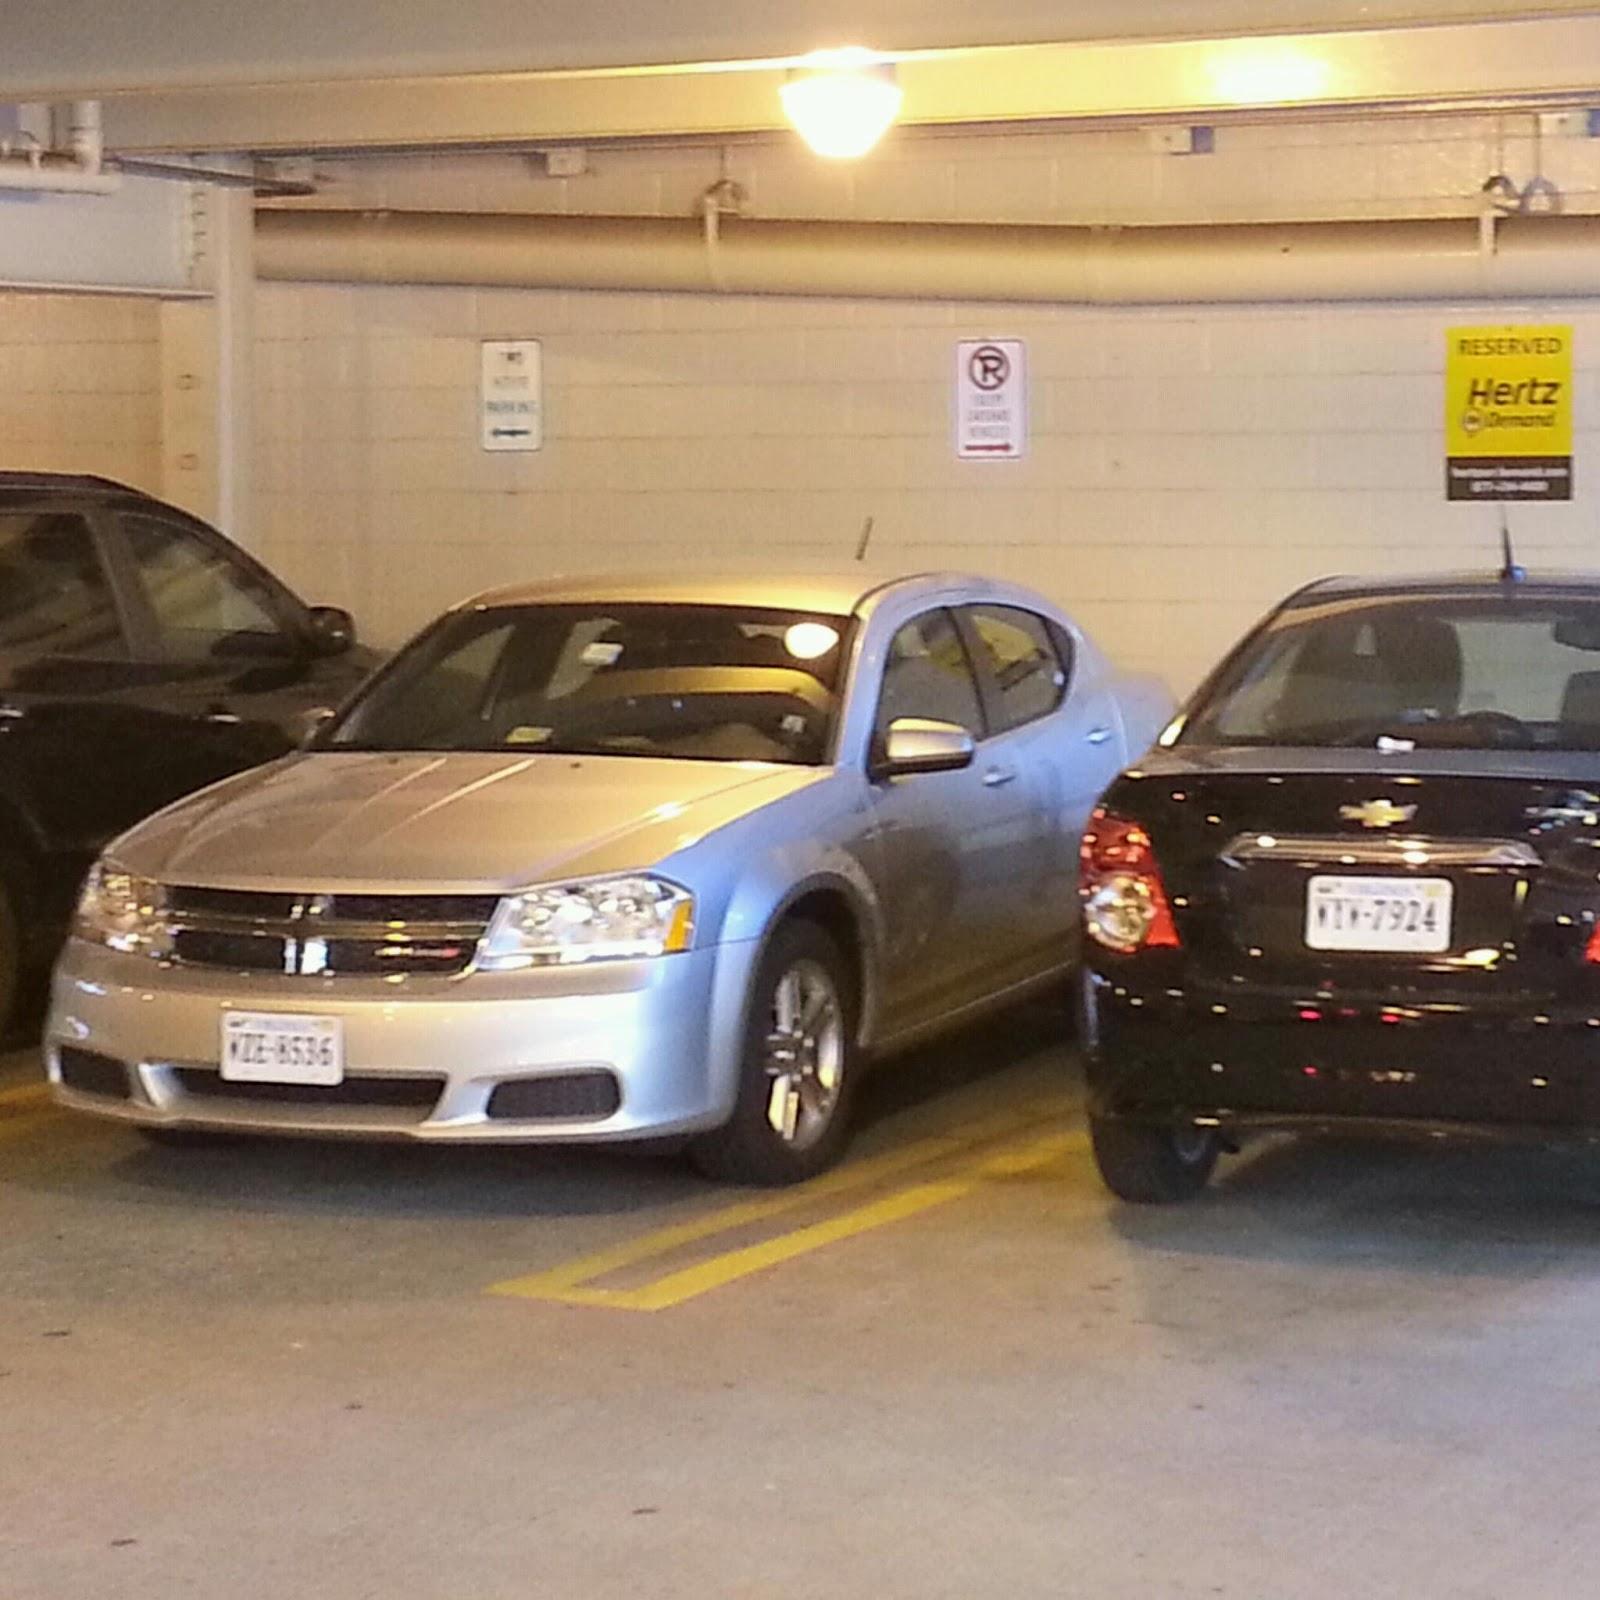 Robert Dyer @ Bethesda Row: HERTZ ON DEMAND CAR-SHARING